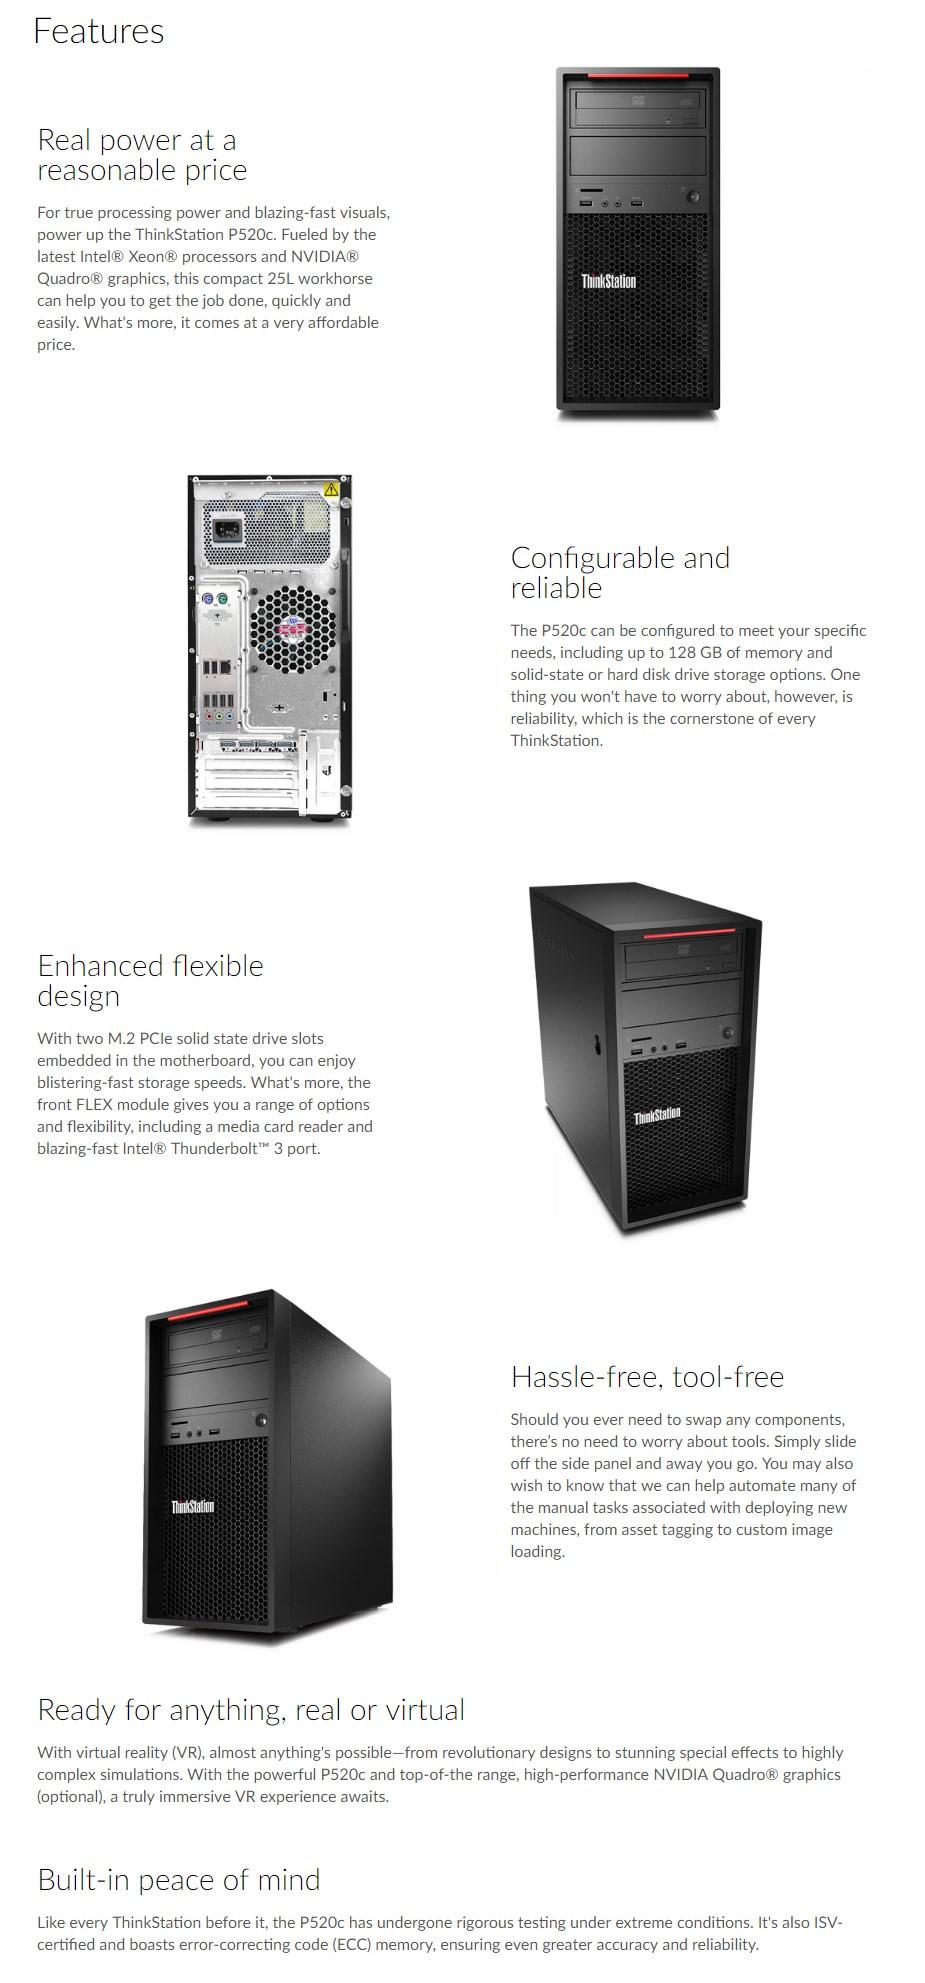 Lenovo ThinkStation P520C Tower Workstation Xeon W-2133 32GB 1TB P4000 Win10 Pro - Desktop Overview 1